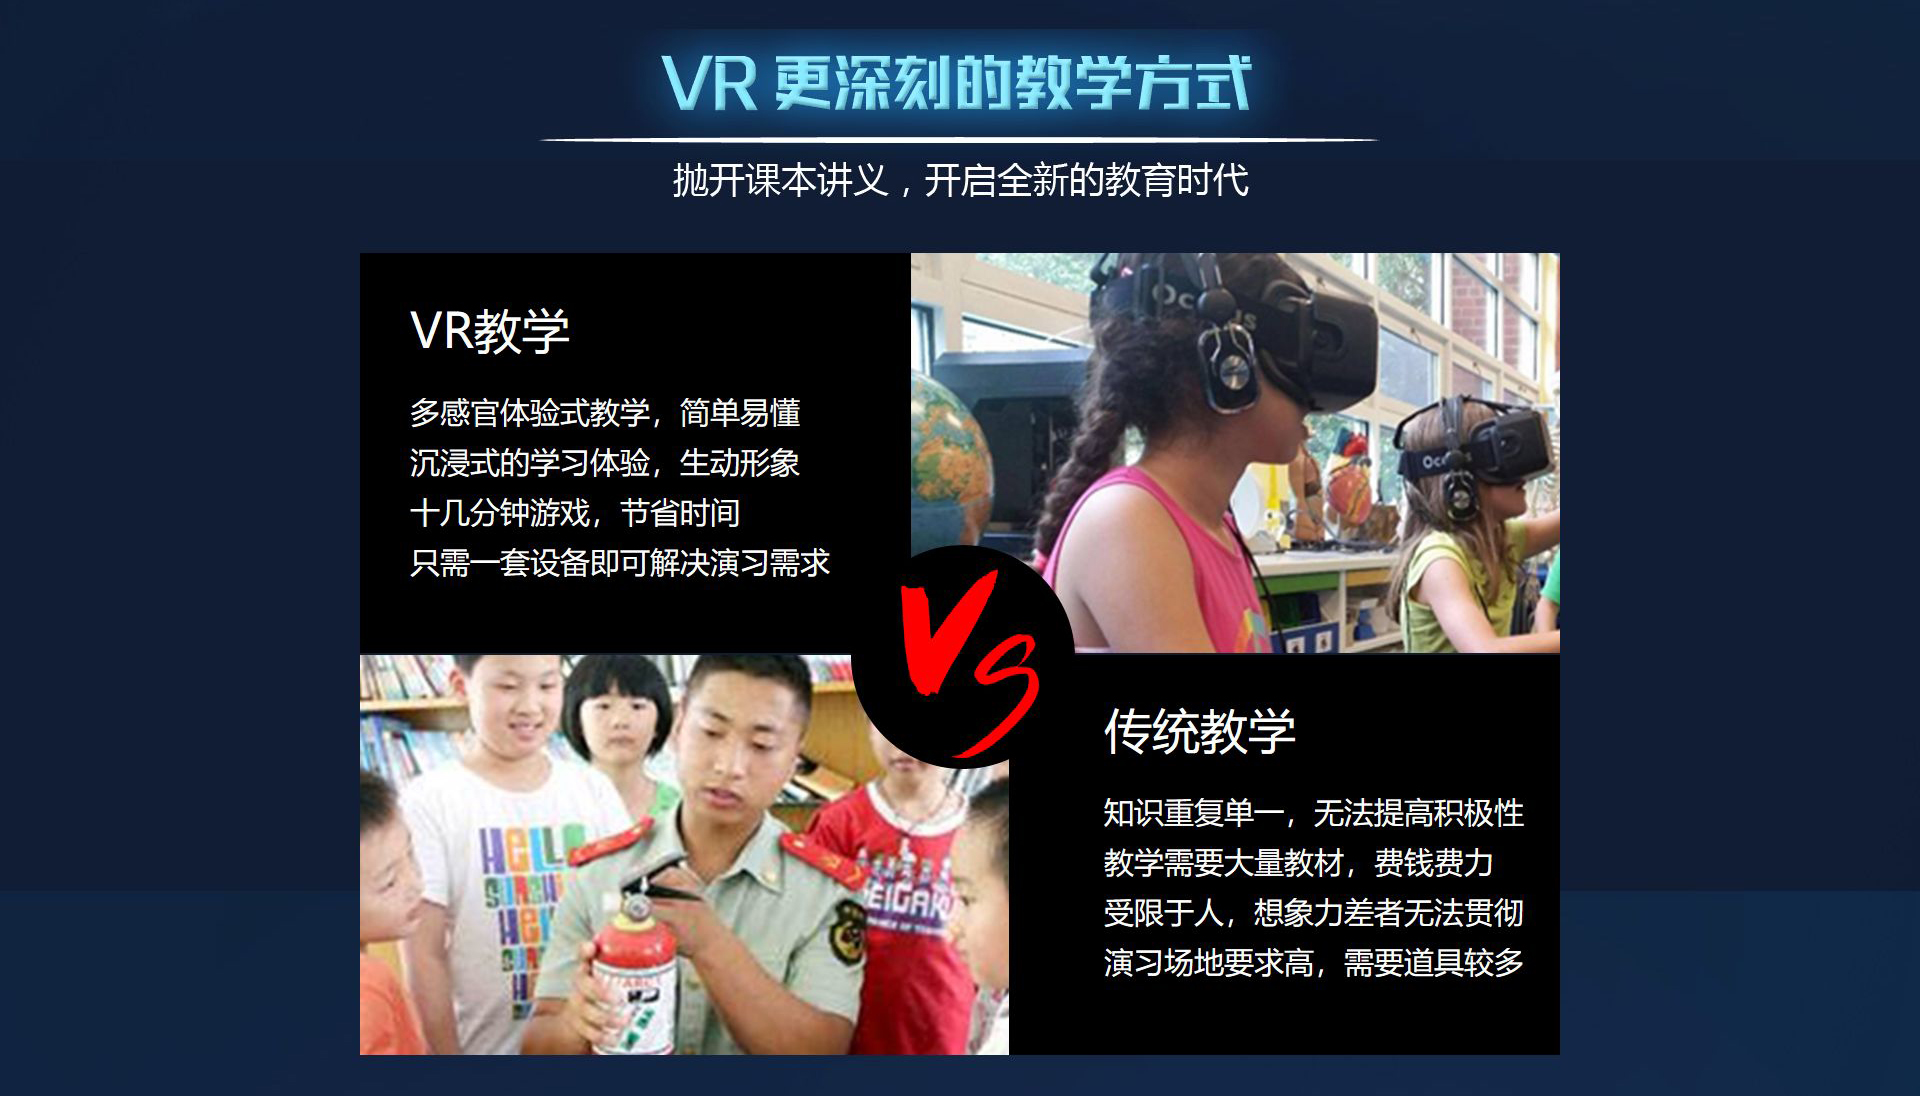 VR科普教育